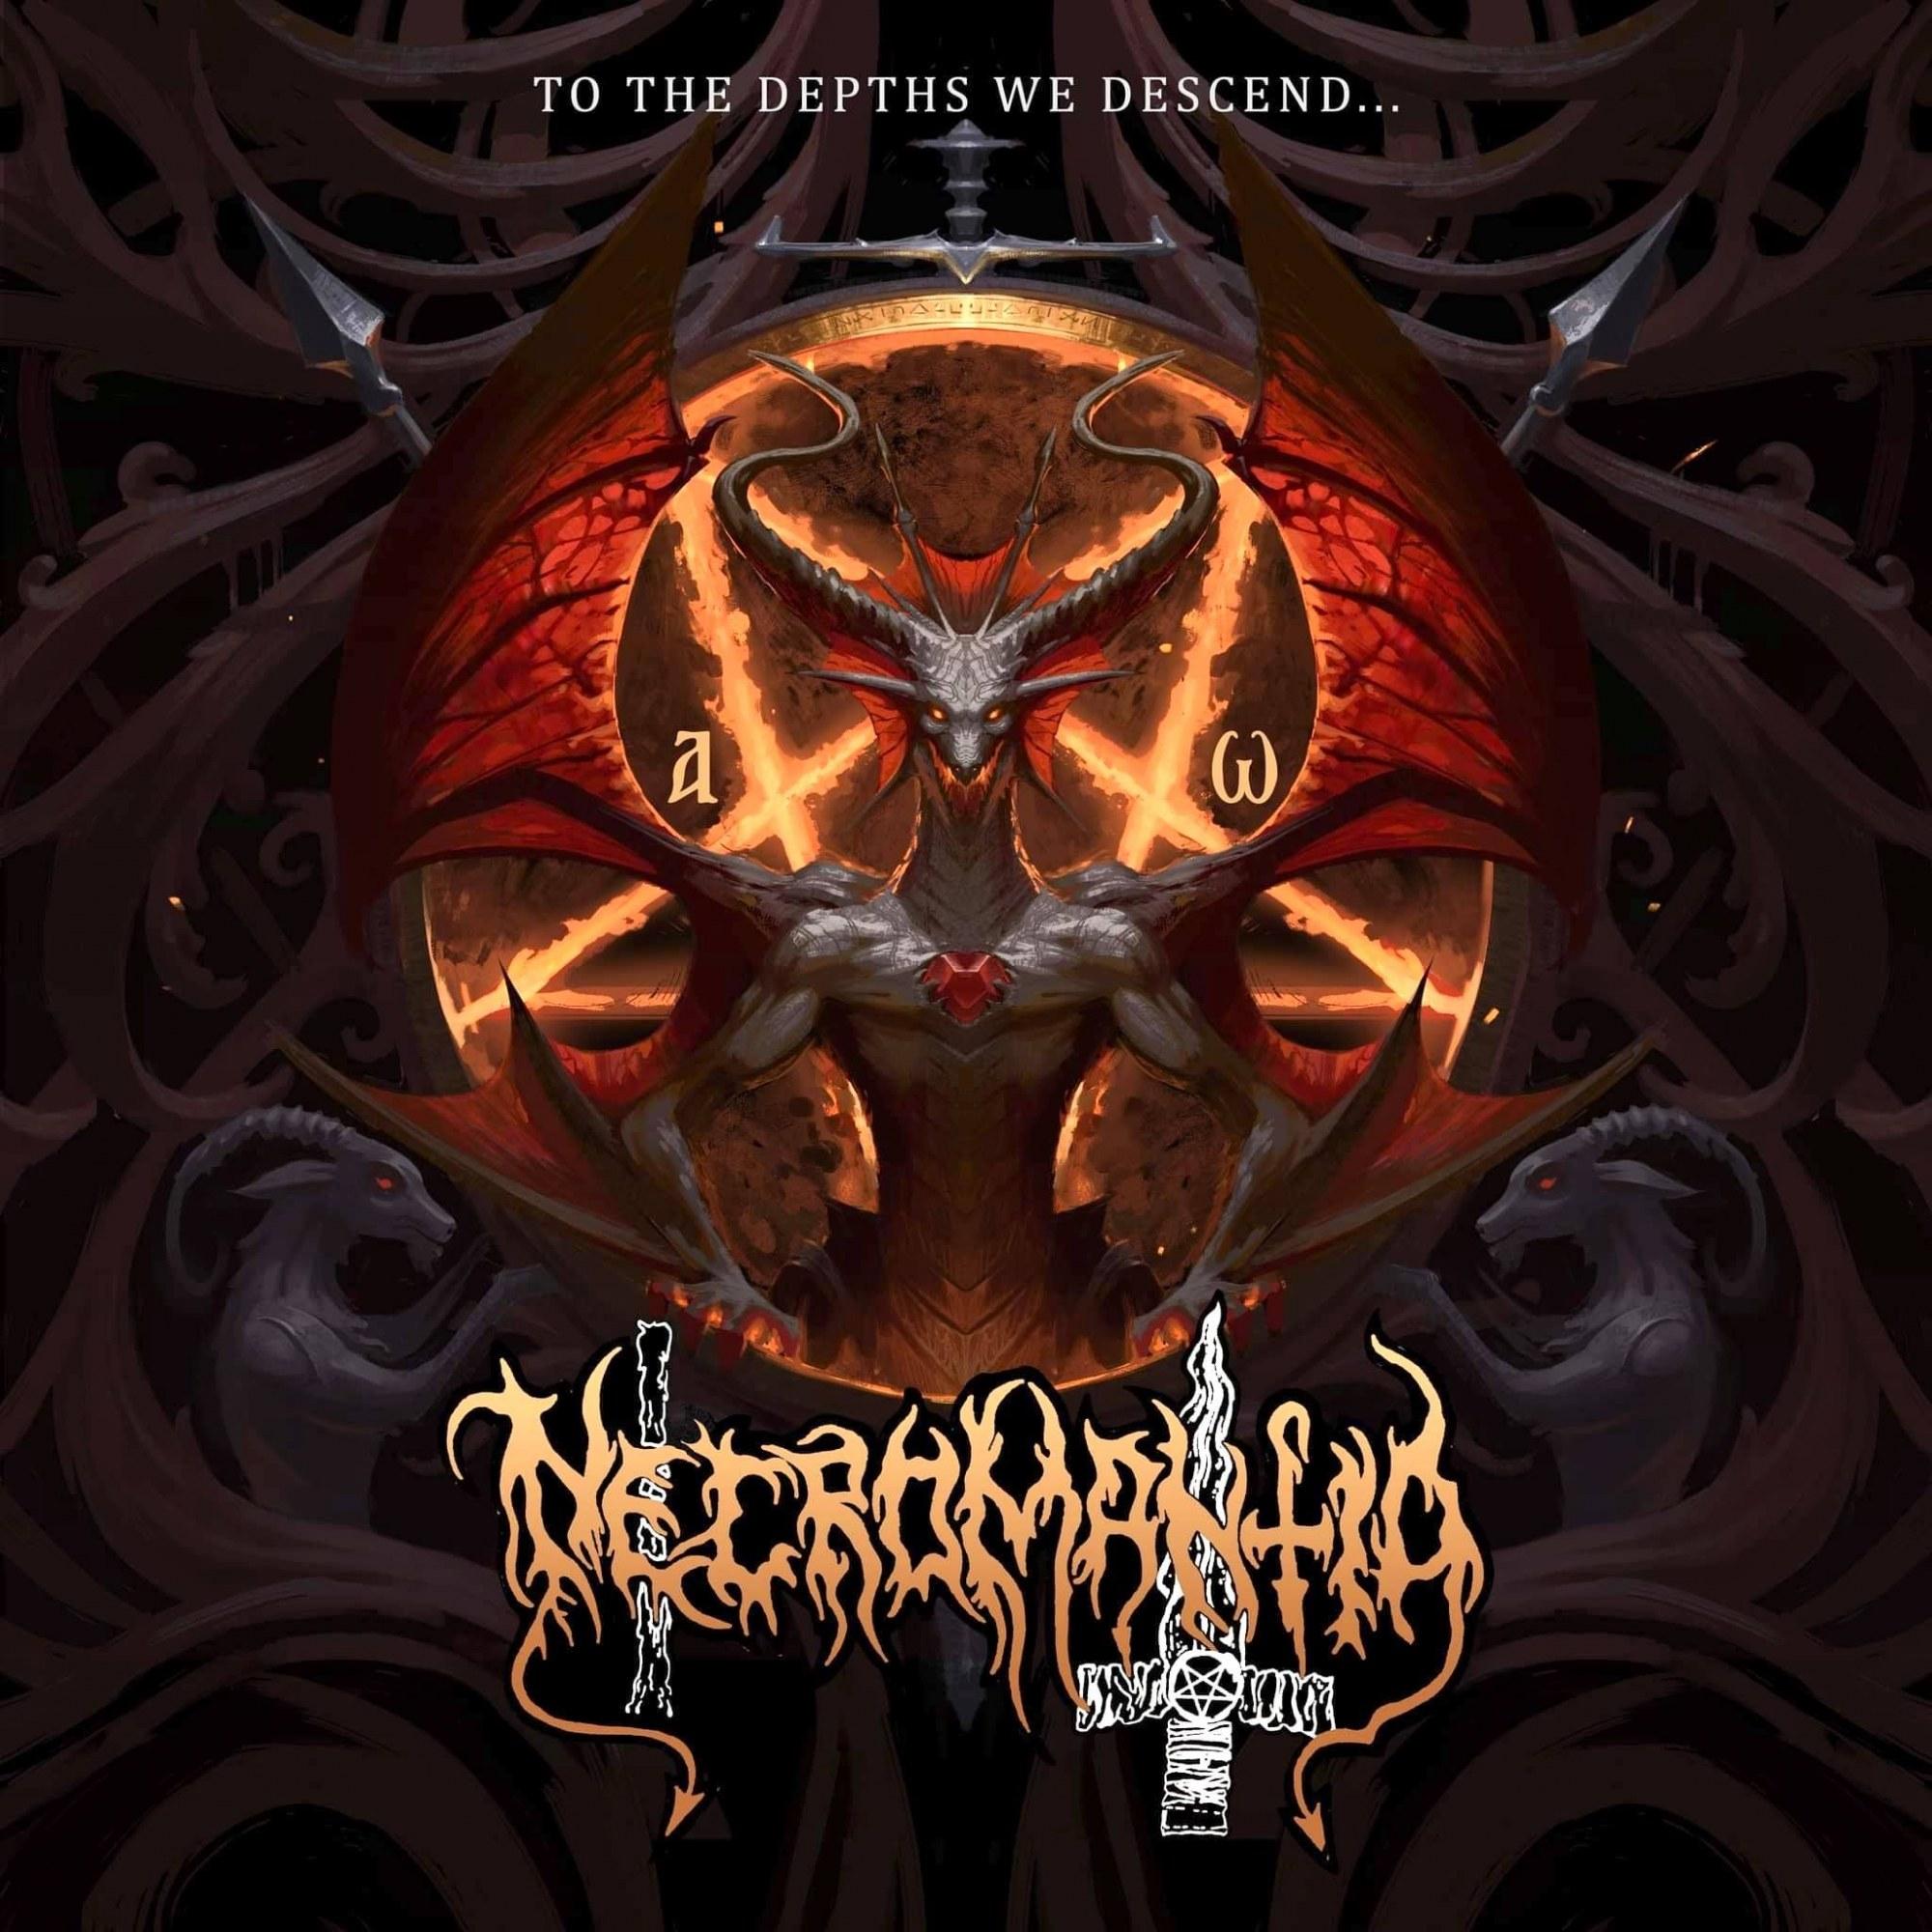 Necromantia - To the Depths We Descend...